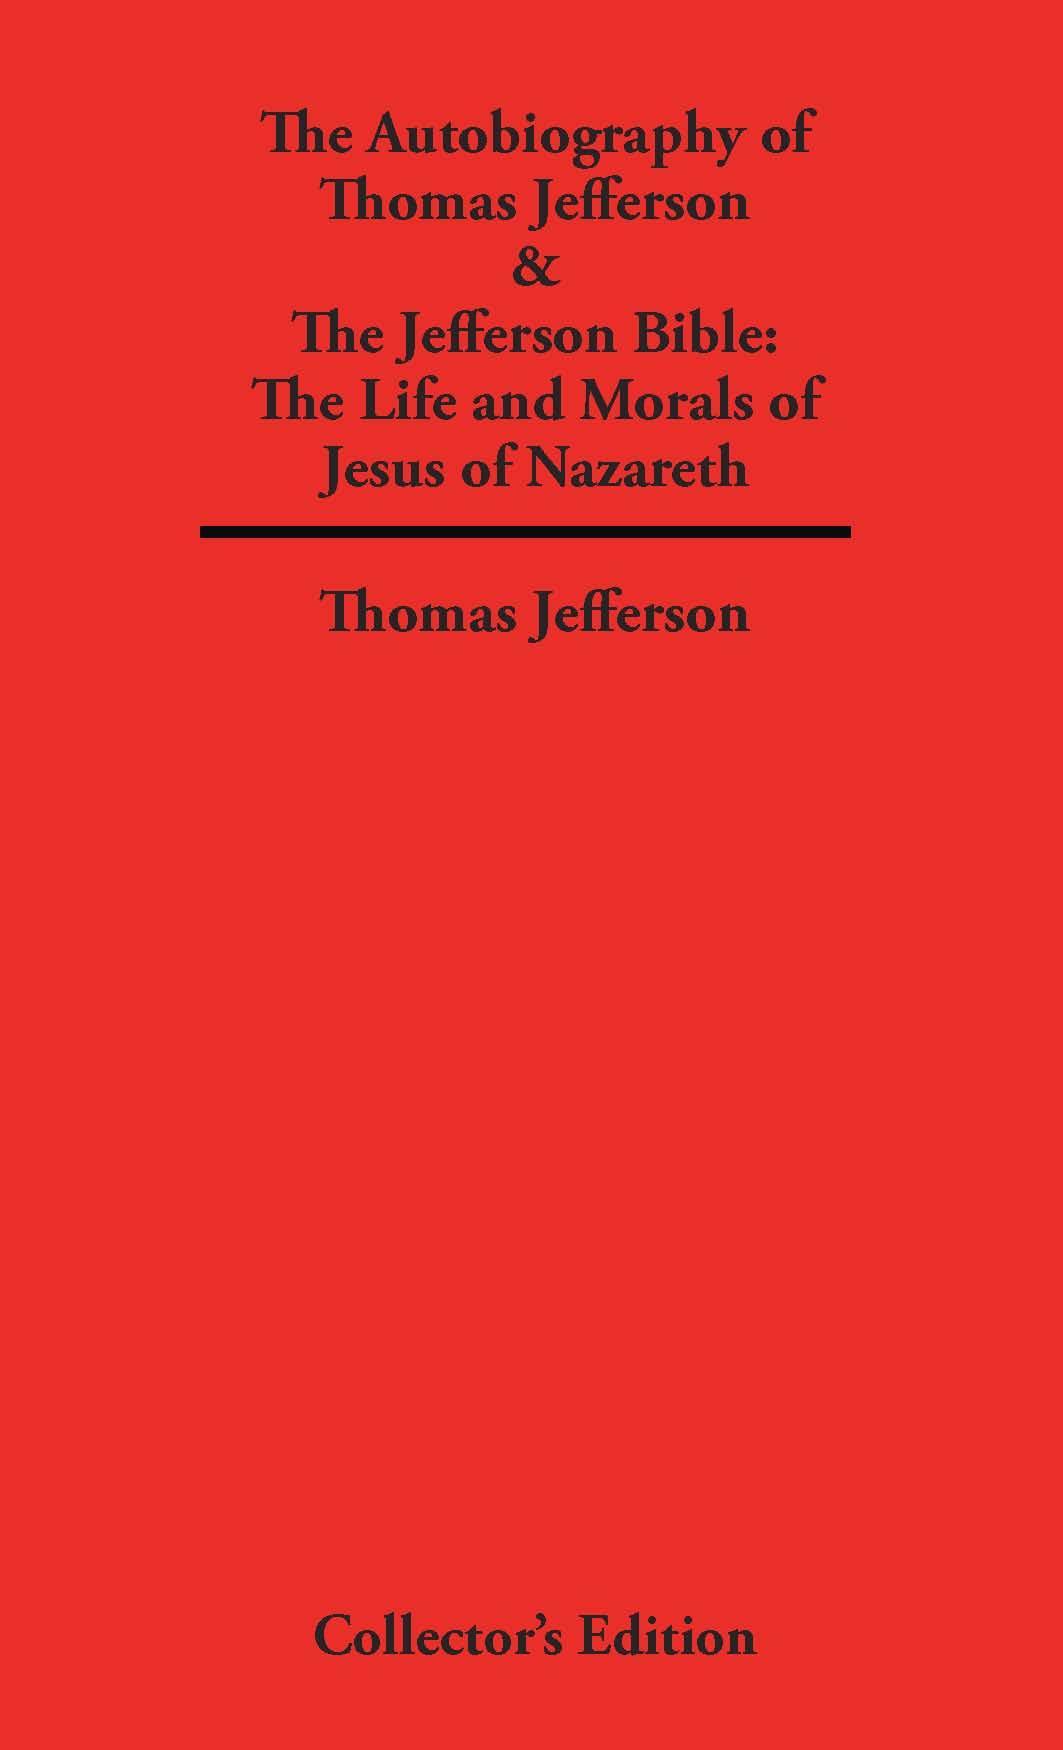 Autobiography of Thomas Jefferson & The Jefferson Bible EB2370002997386